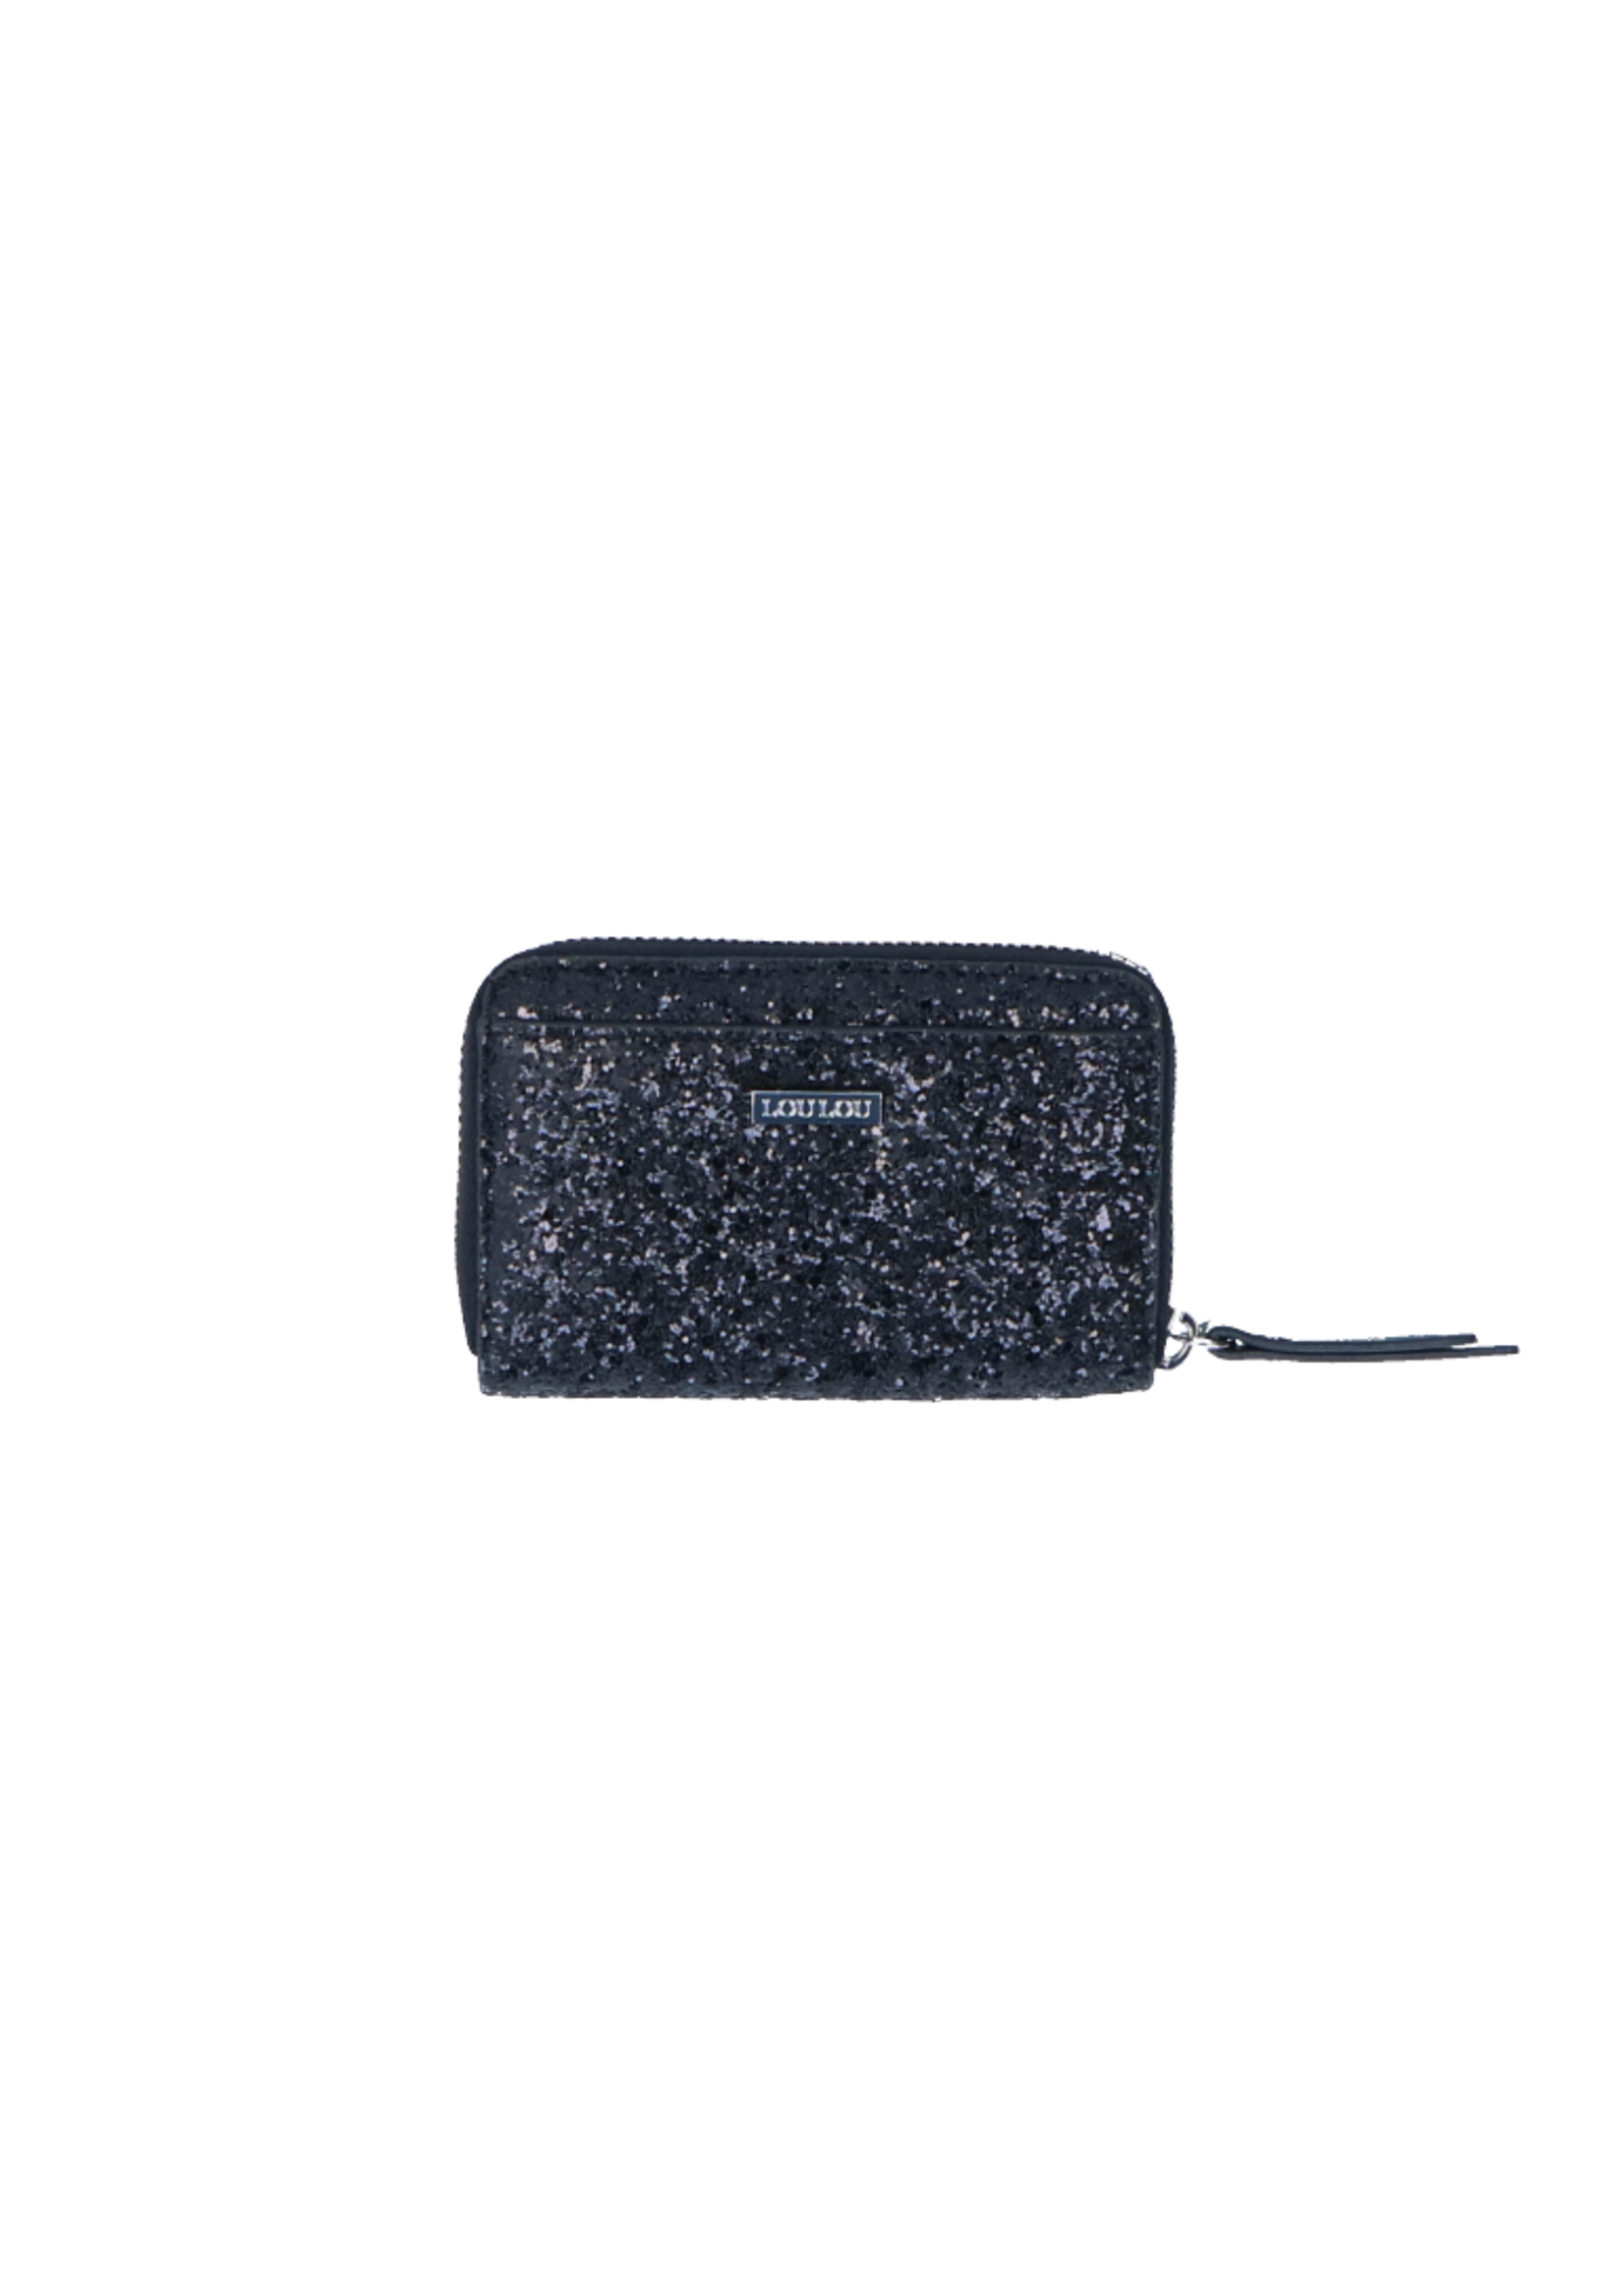 LouLou Kleine RFID Portemonnee Stardust - Caviar